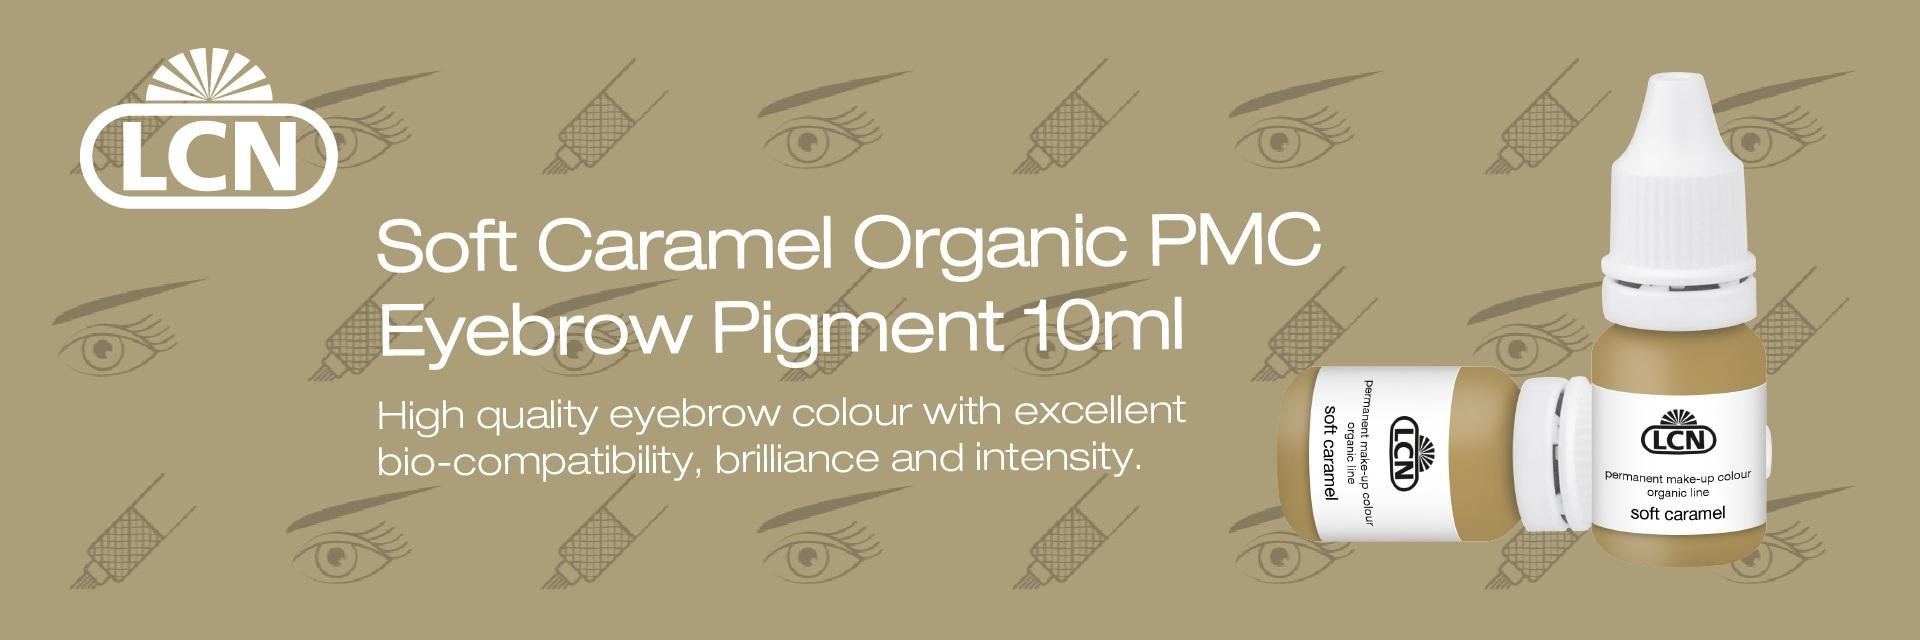 Soft Caramel Organic PMC Eyebrow Pigment LCN